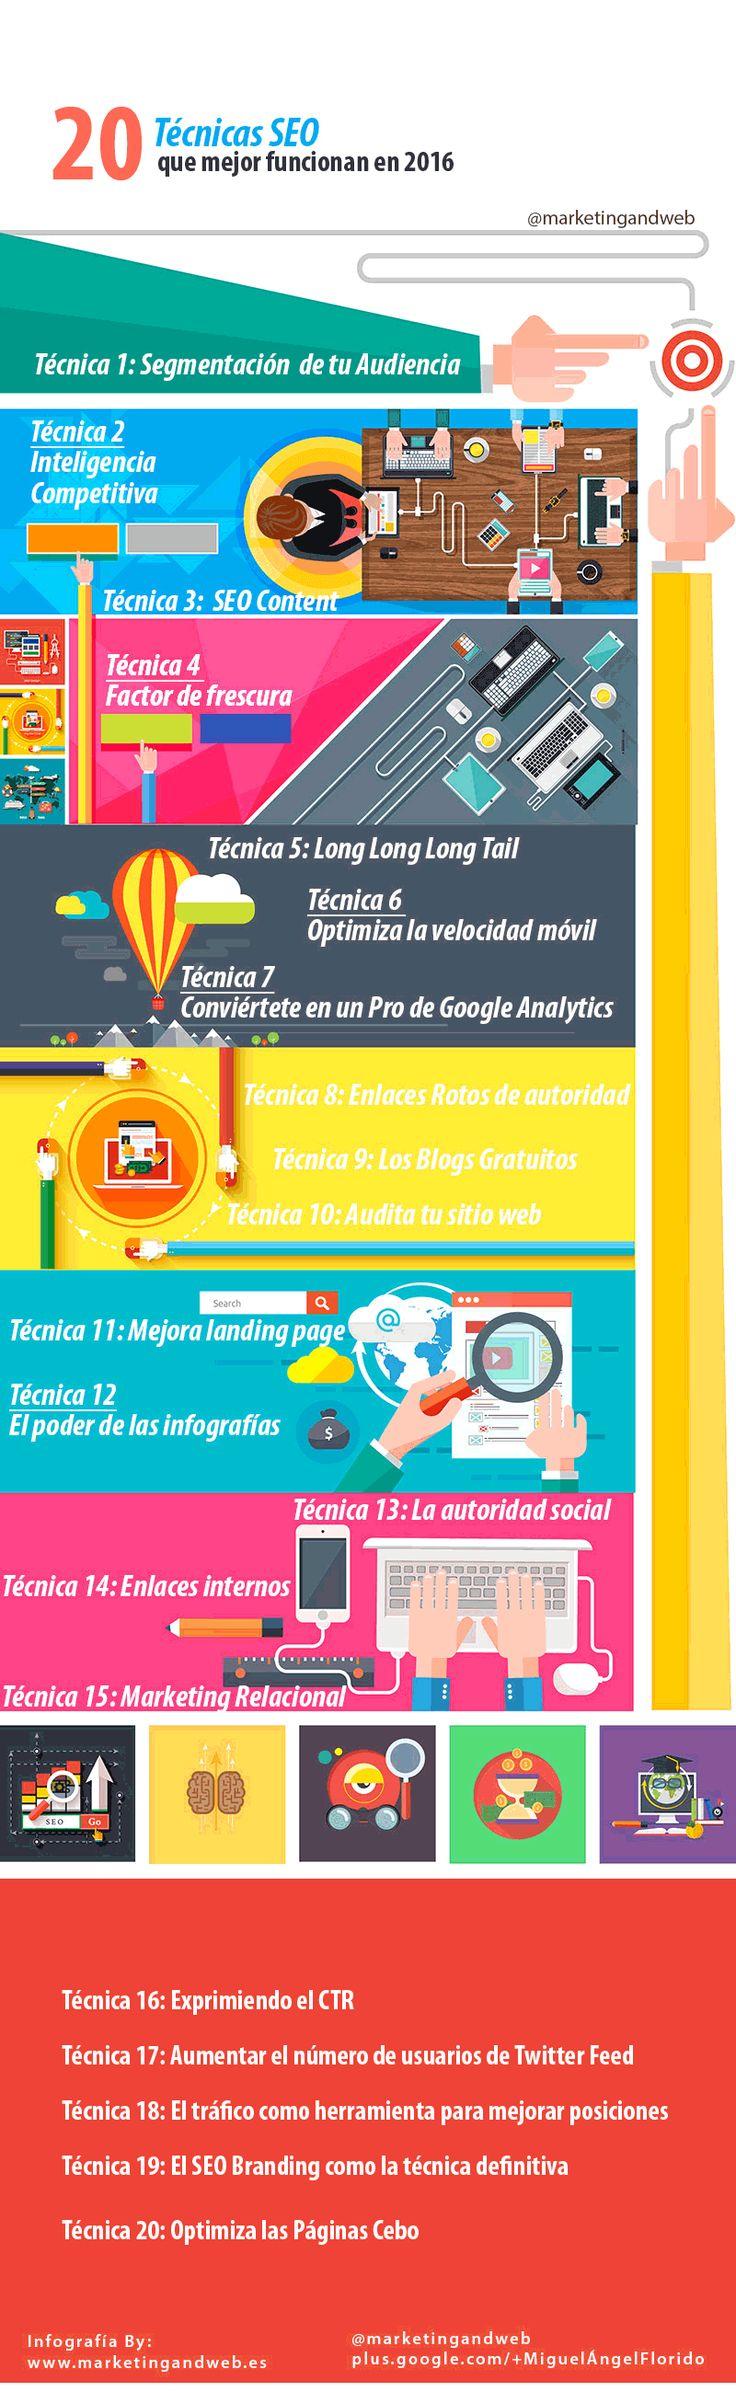 20 técnicas SEO que mejor funcionan en 2016. Infografía en español. #CommunityManager